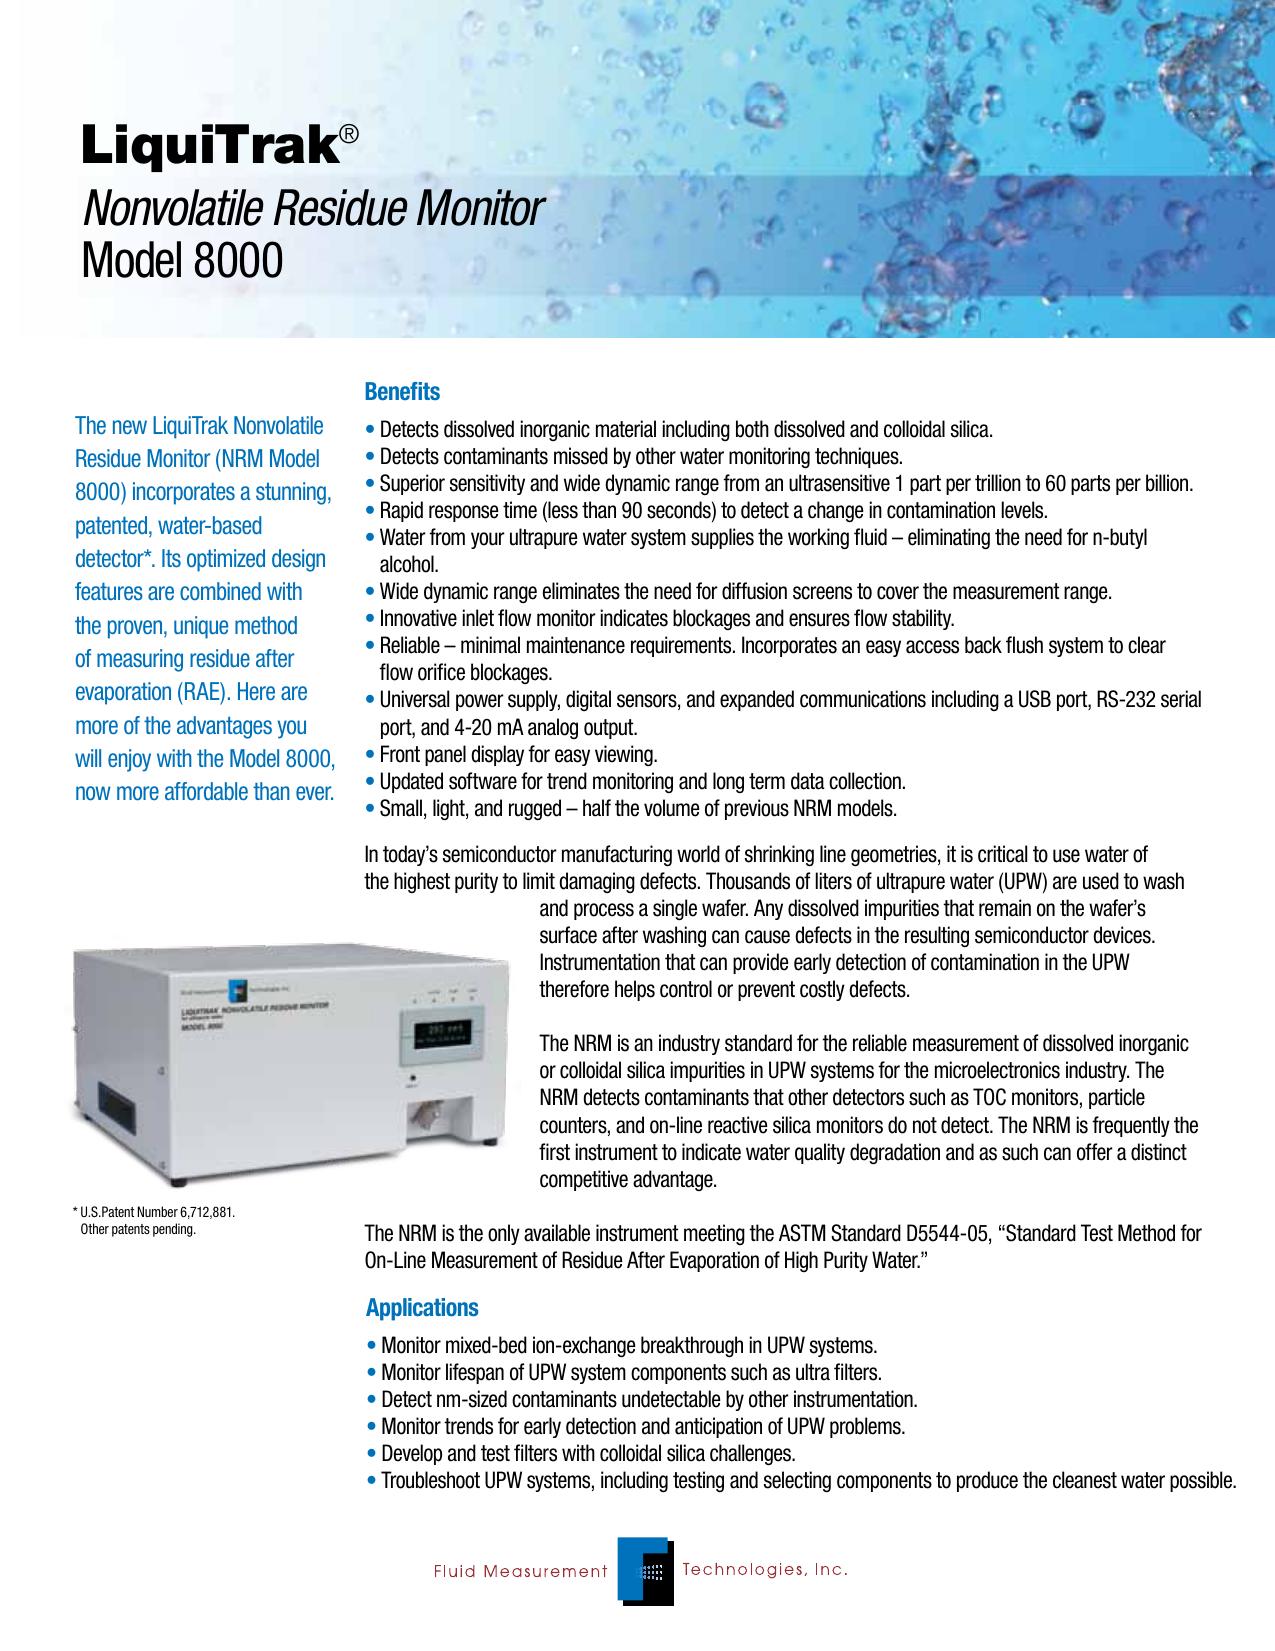 LiquiTrak - Kanomax FMT, Inc  | manualzz com